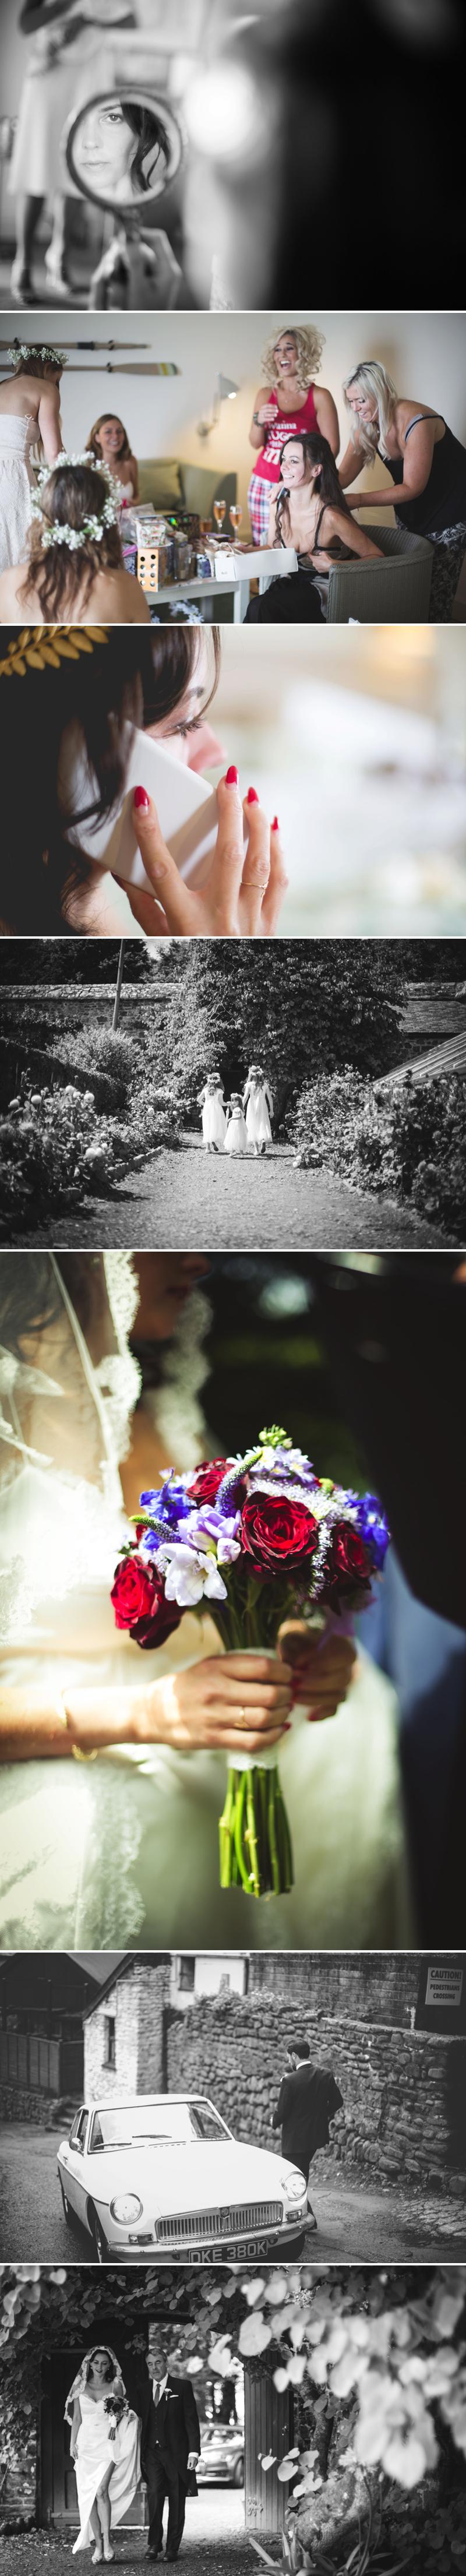 wedding-venues-in-devon-clovelly-village-weddings-001